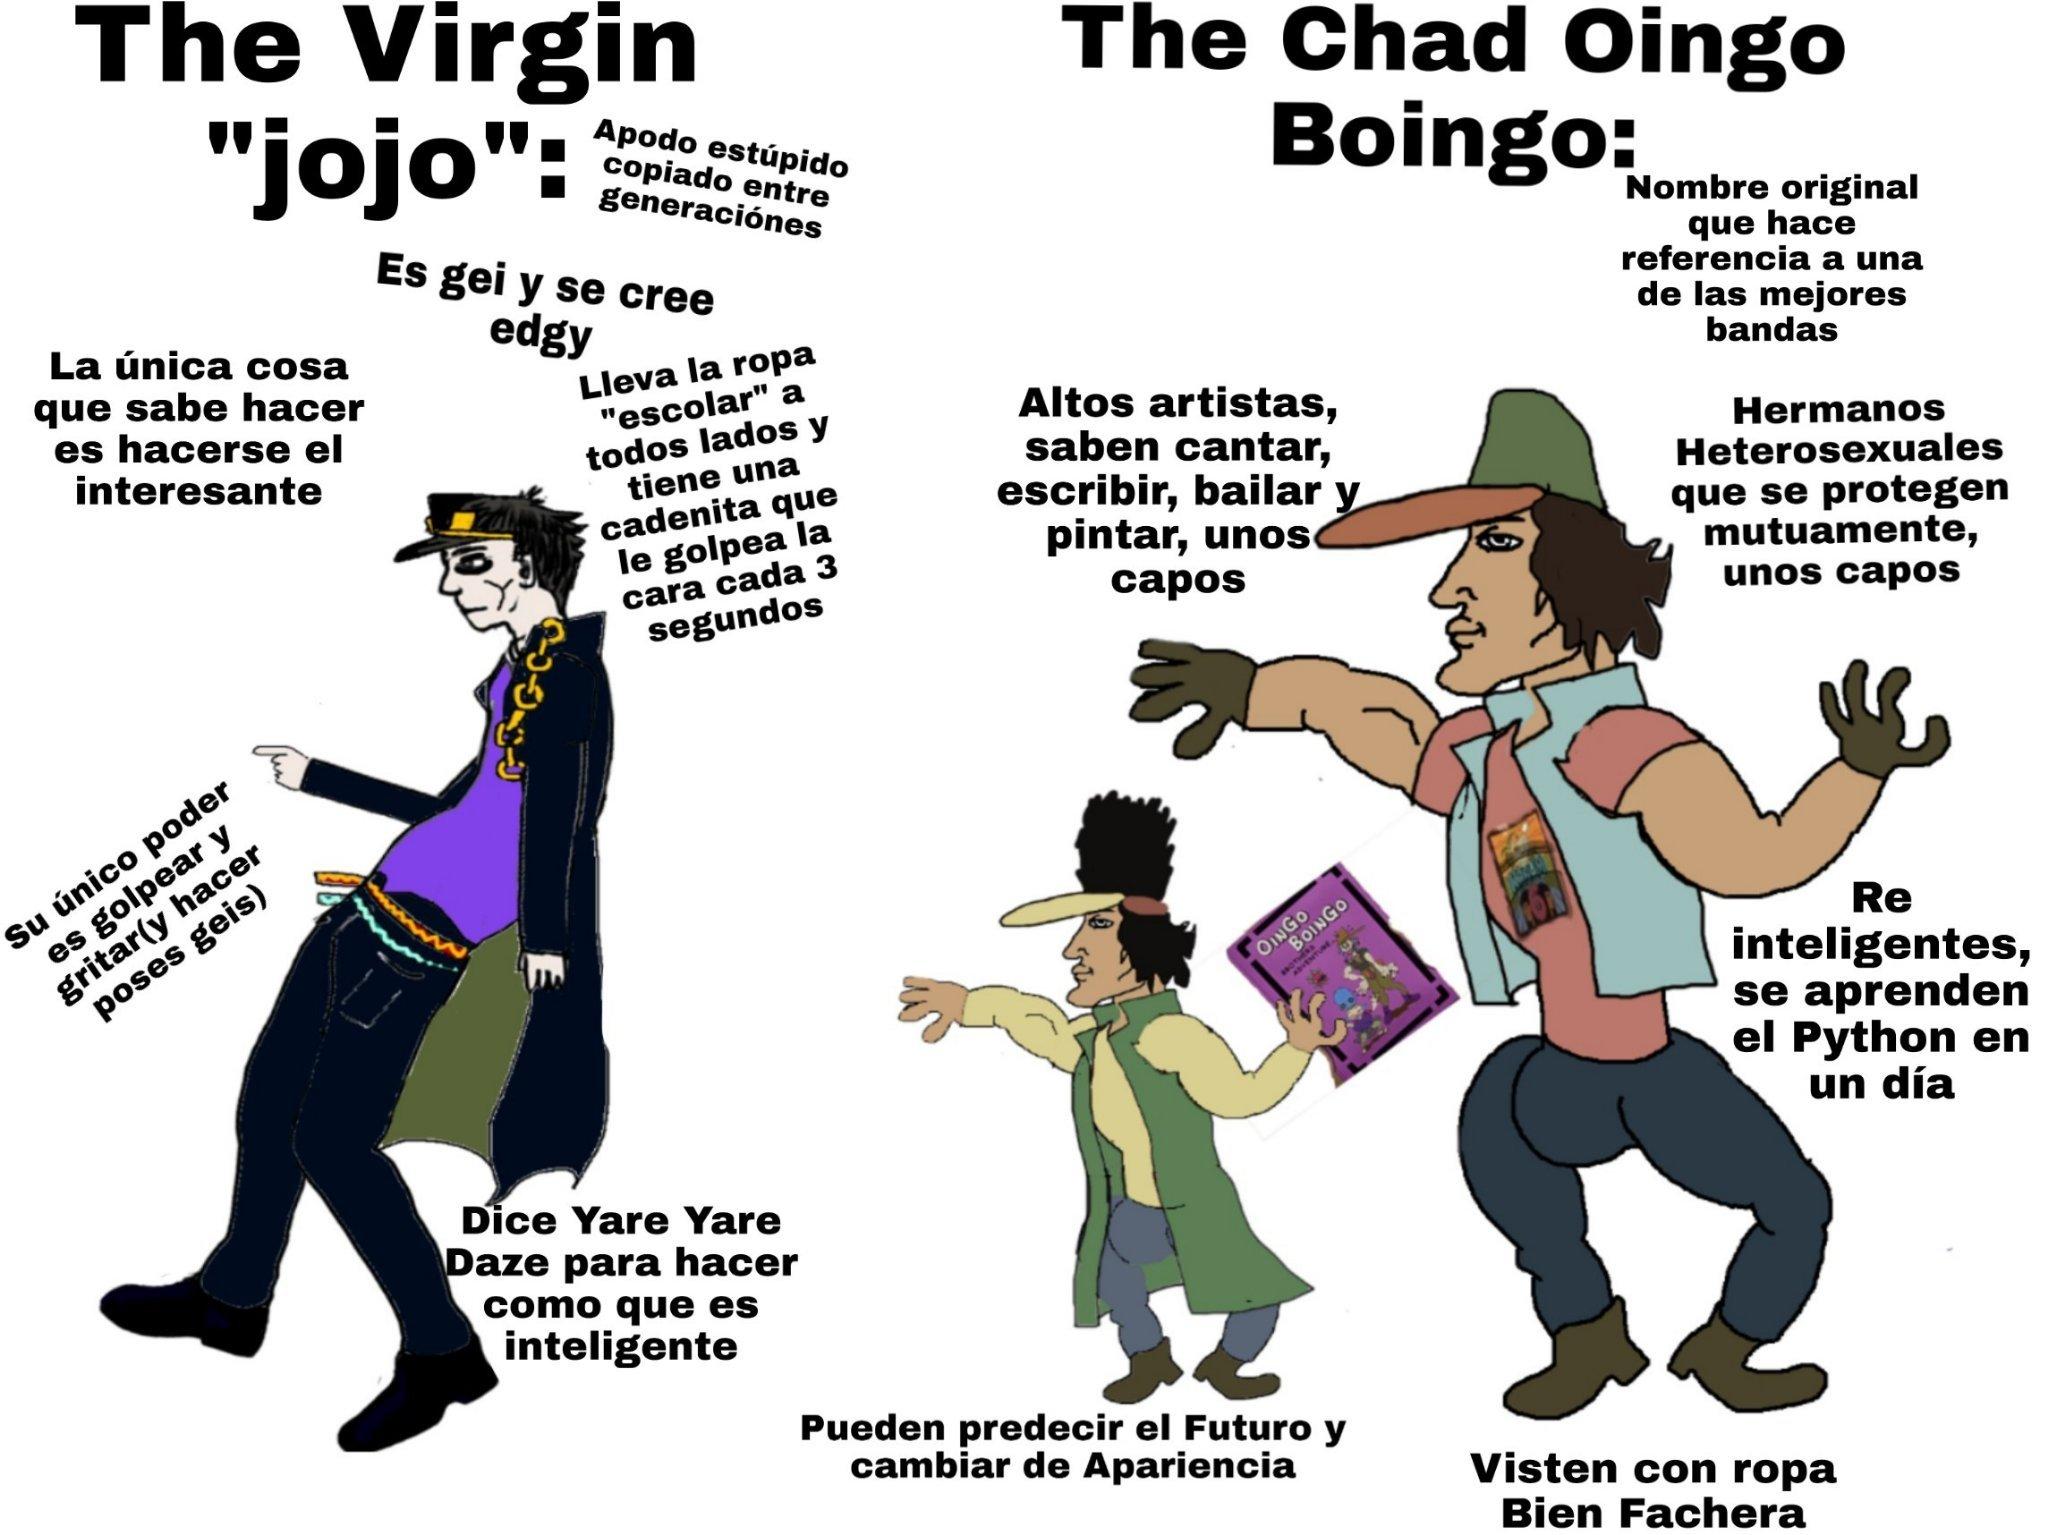 Oingo Boingo Brothers Meme By Doge27 2 Memedroid The ending from jojo's bizarre adventure: memedroid